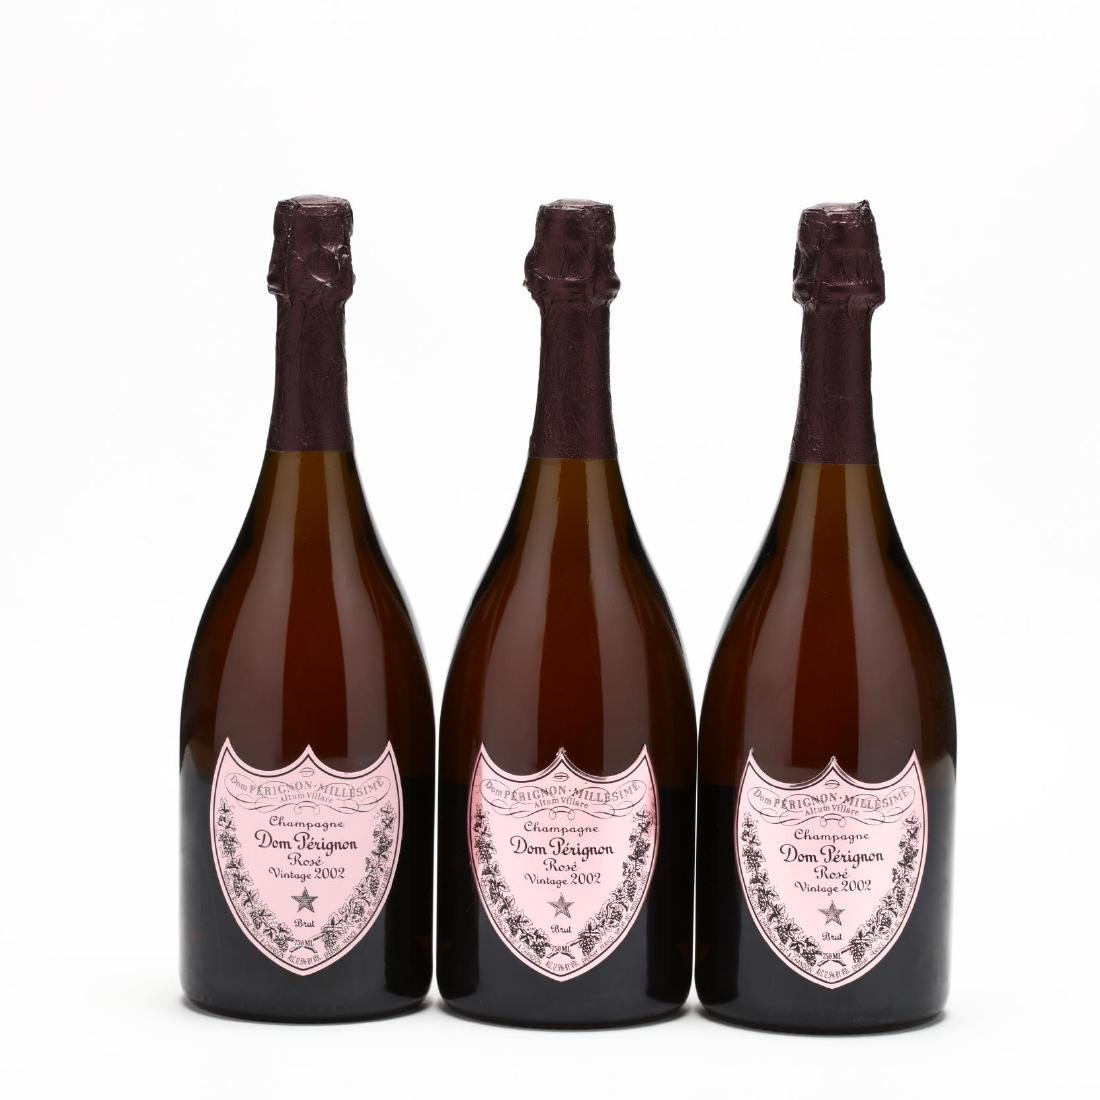 2002 Moet et Chandon Champagne